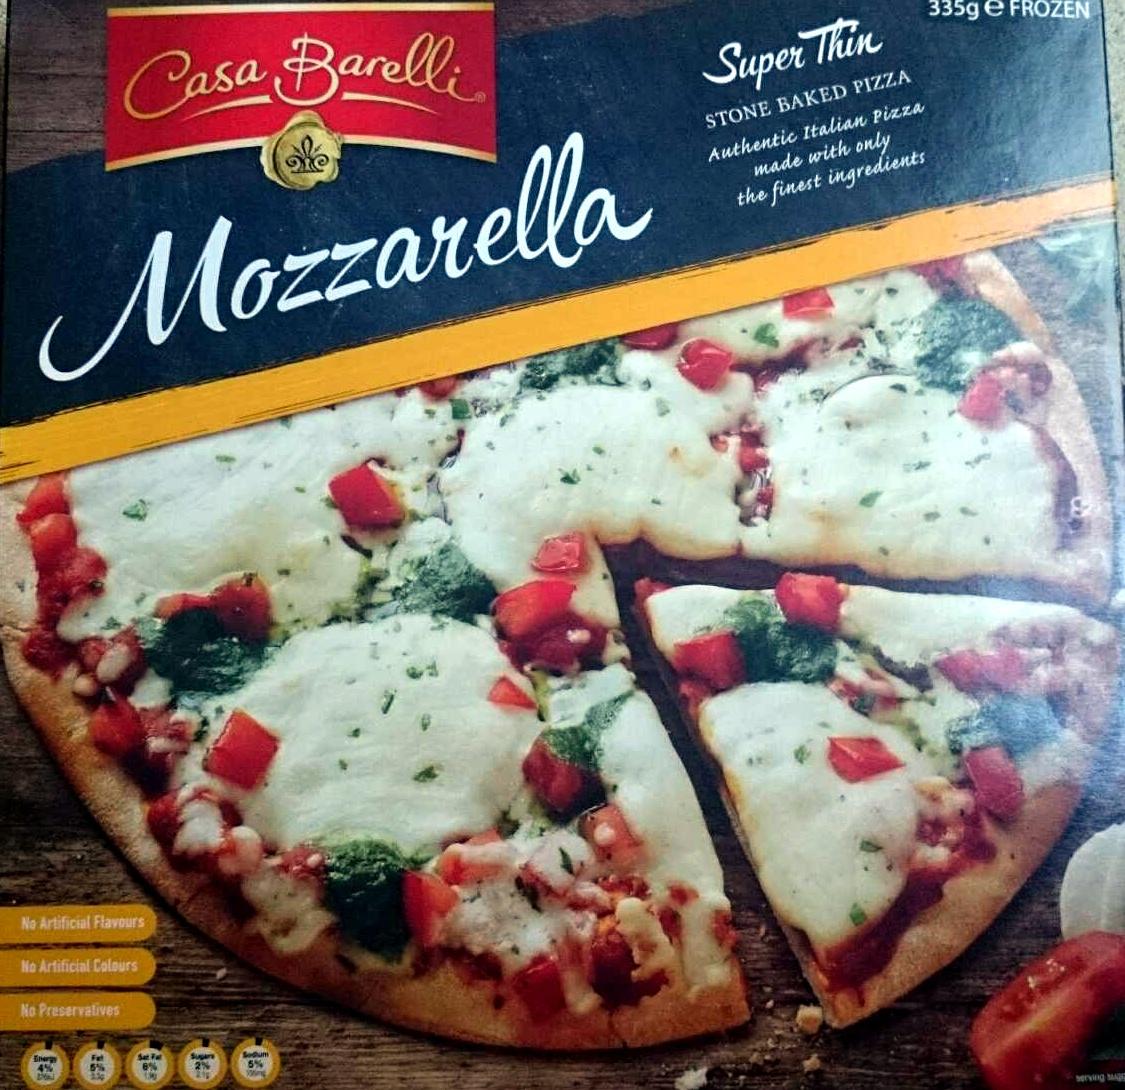 Mozarella Super Thin Stone Baked Pizza - Product - en